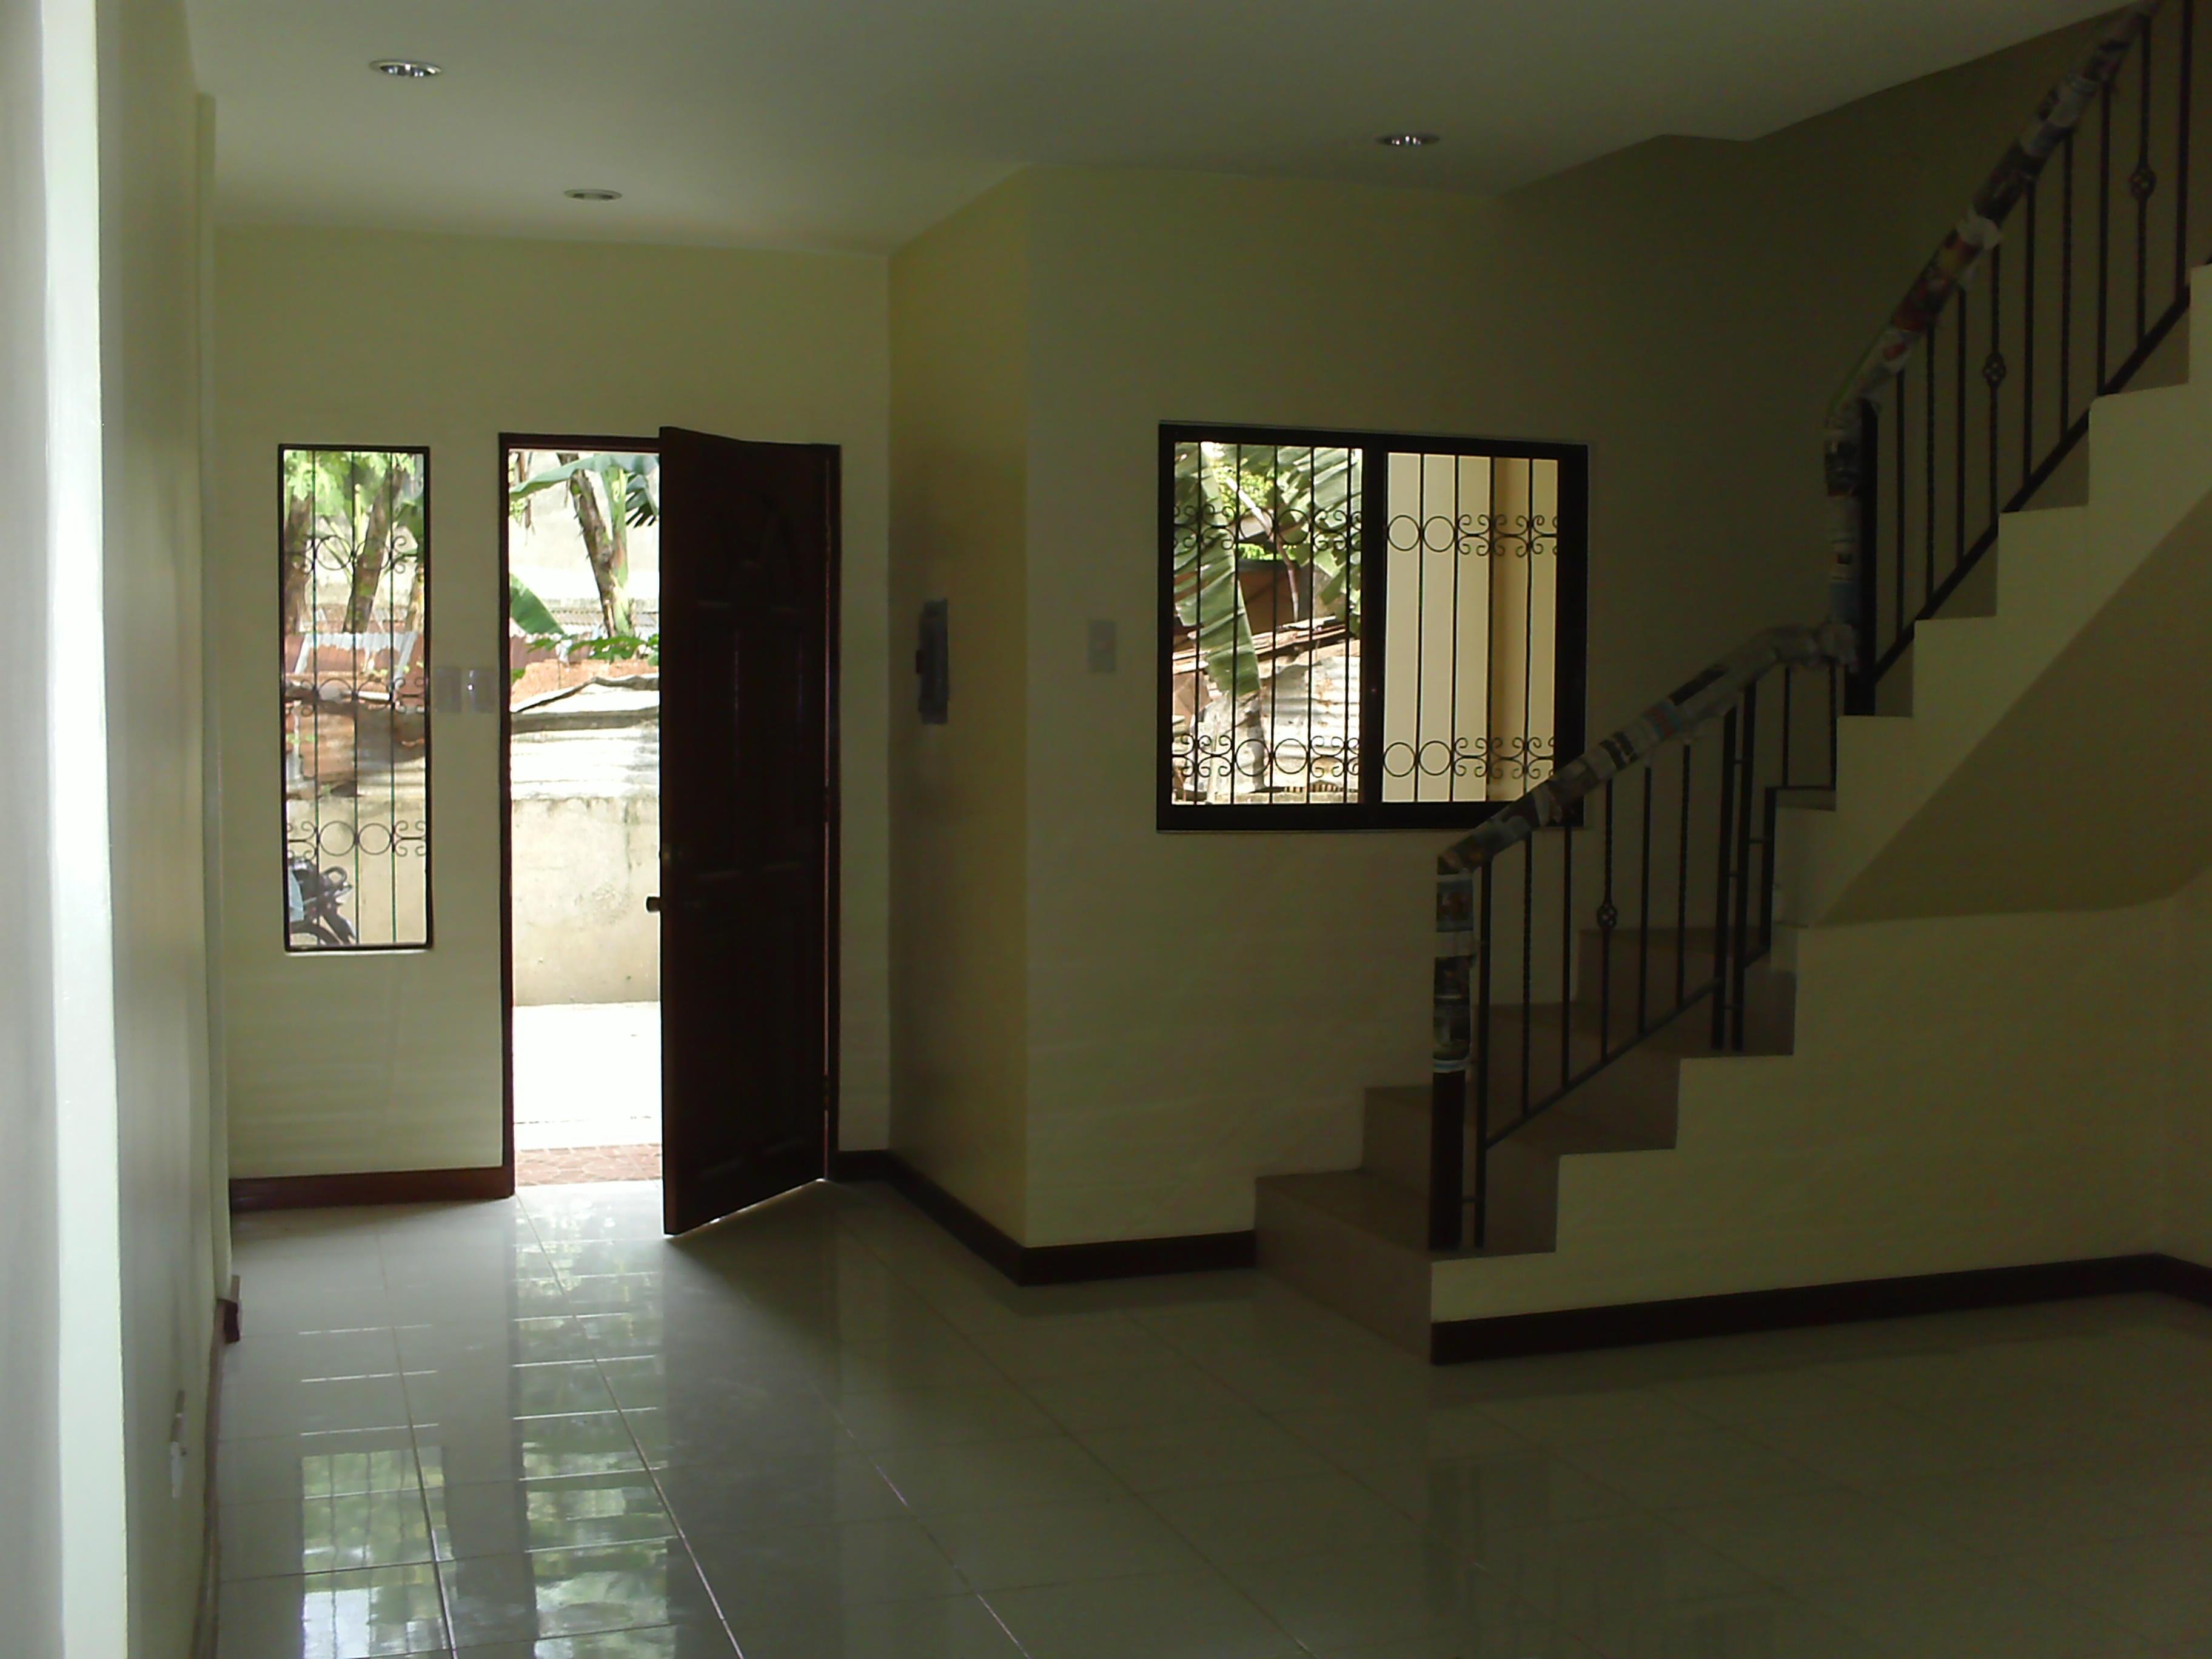 FOR RENT / LEASE: Apartment / Condo / Townhouse Cebu > Cebu City 2